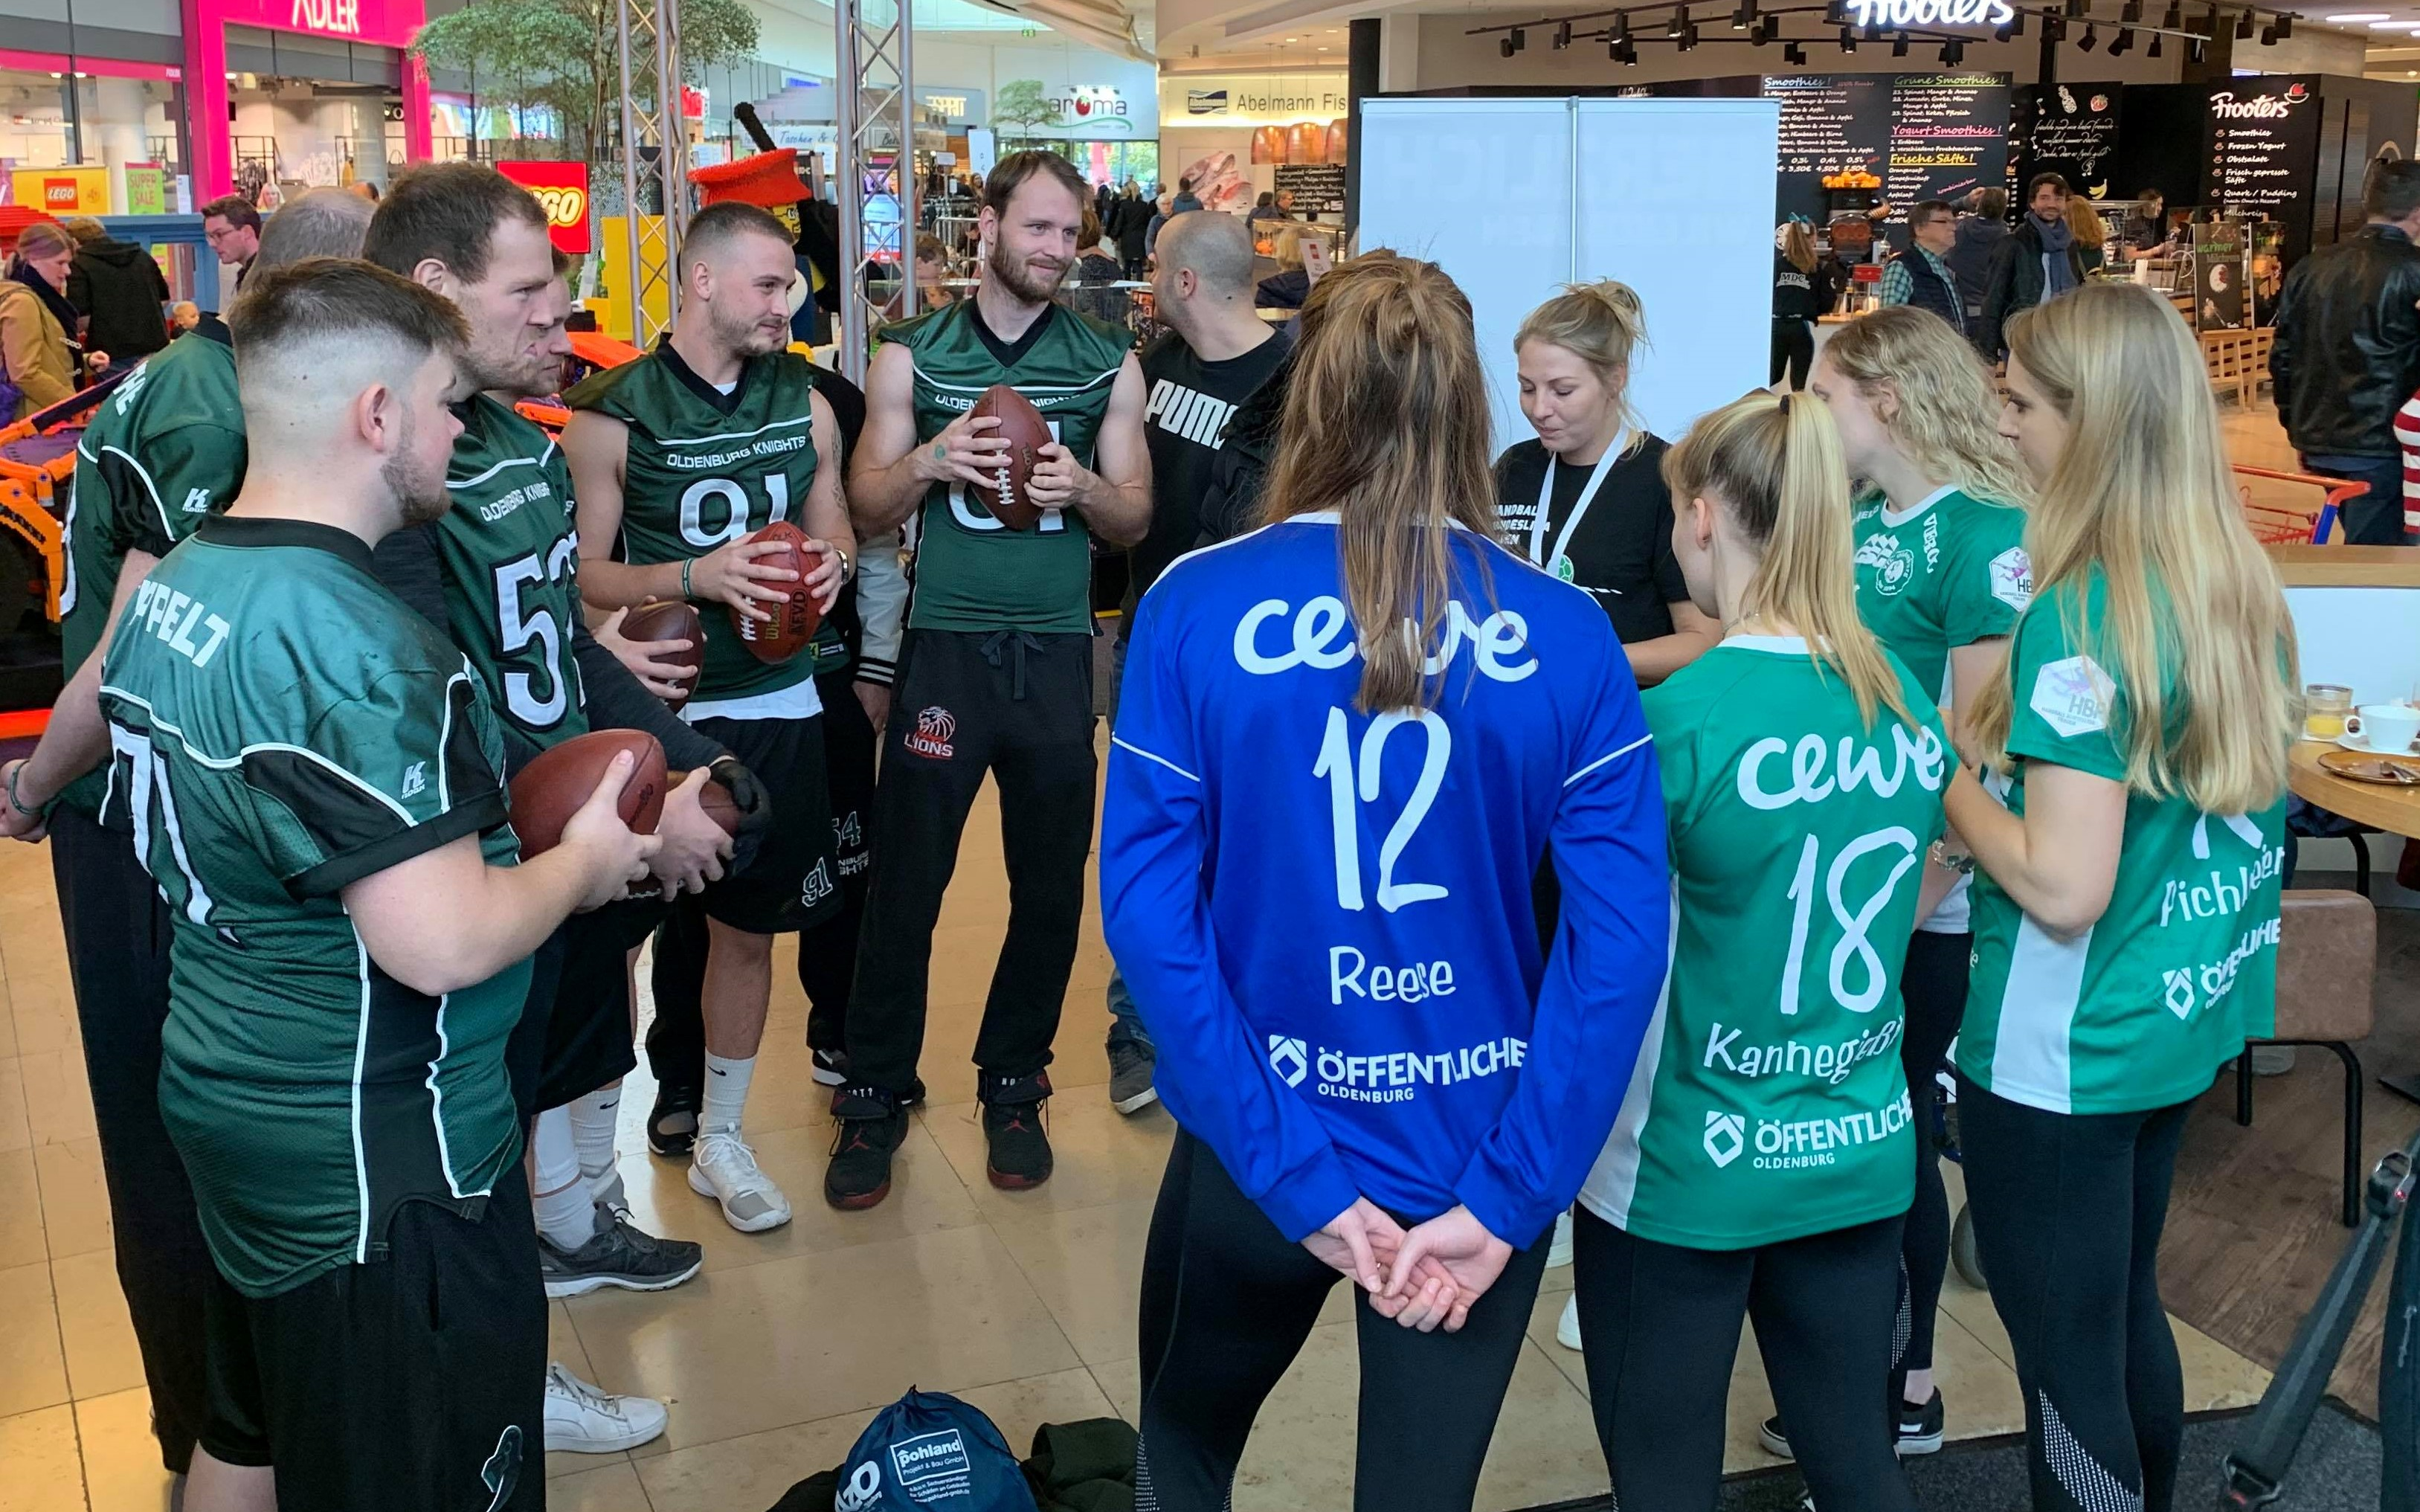 https://www.oldenburgknights.de/wp-content/uploads/2019/10/VfL-Teambattles.jpg